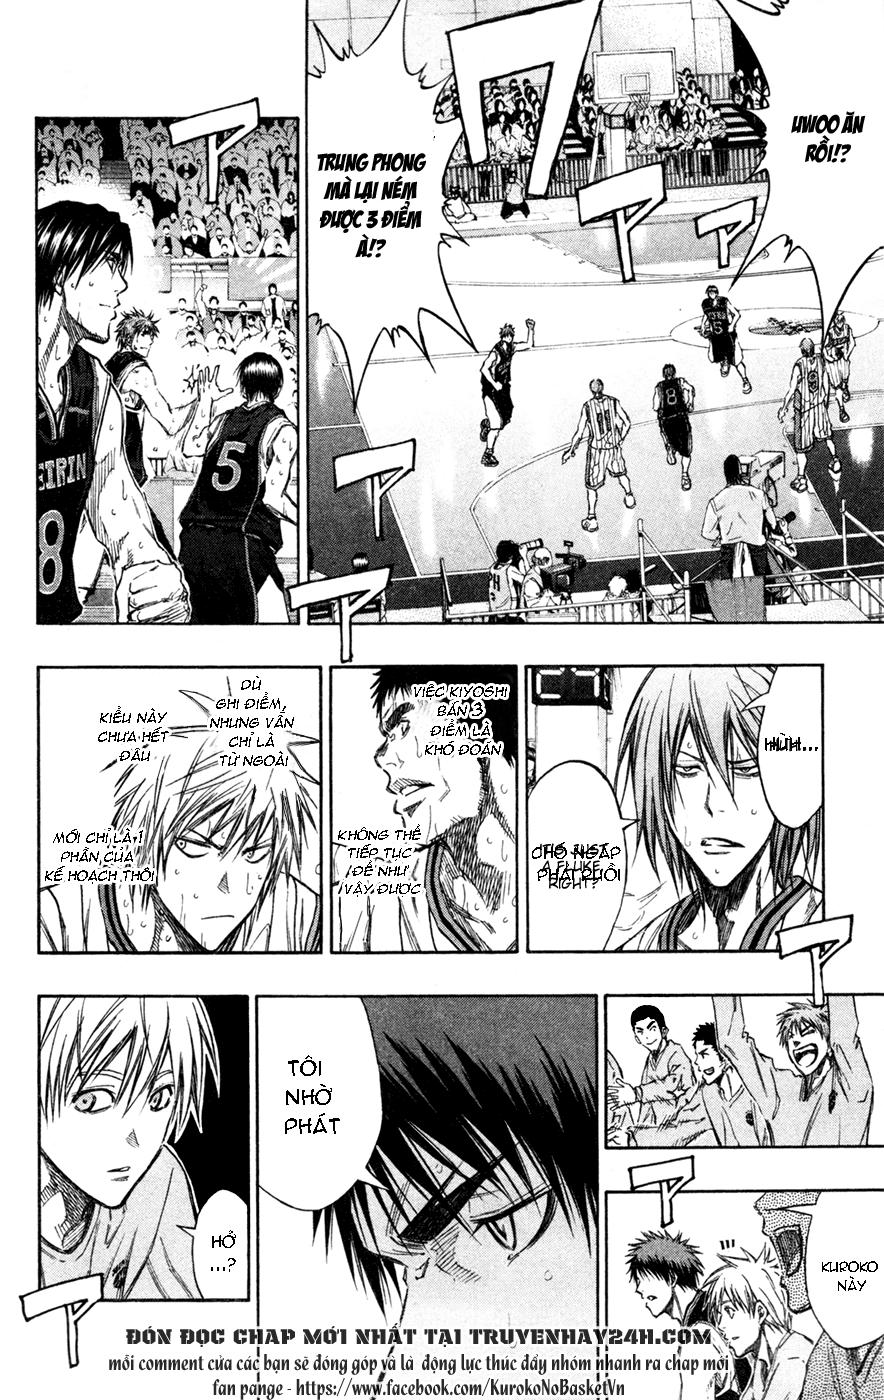 Kuroko No Basket chap 152 trang 10